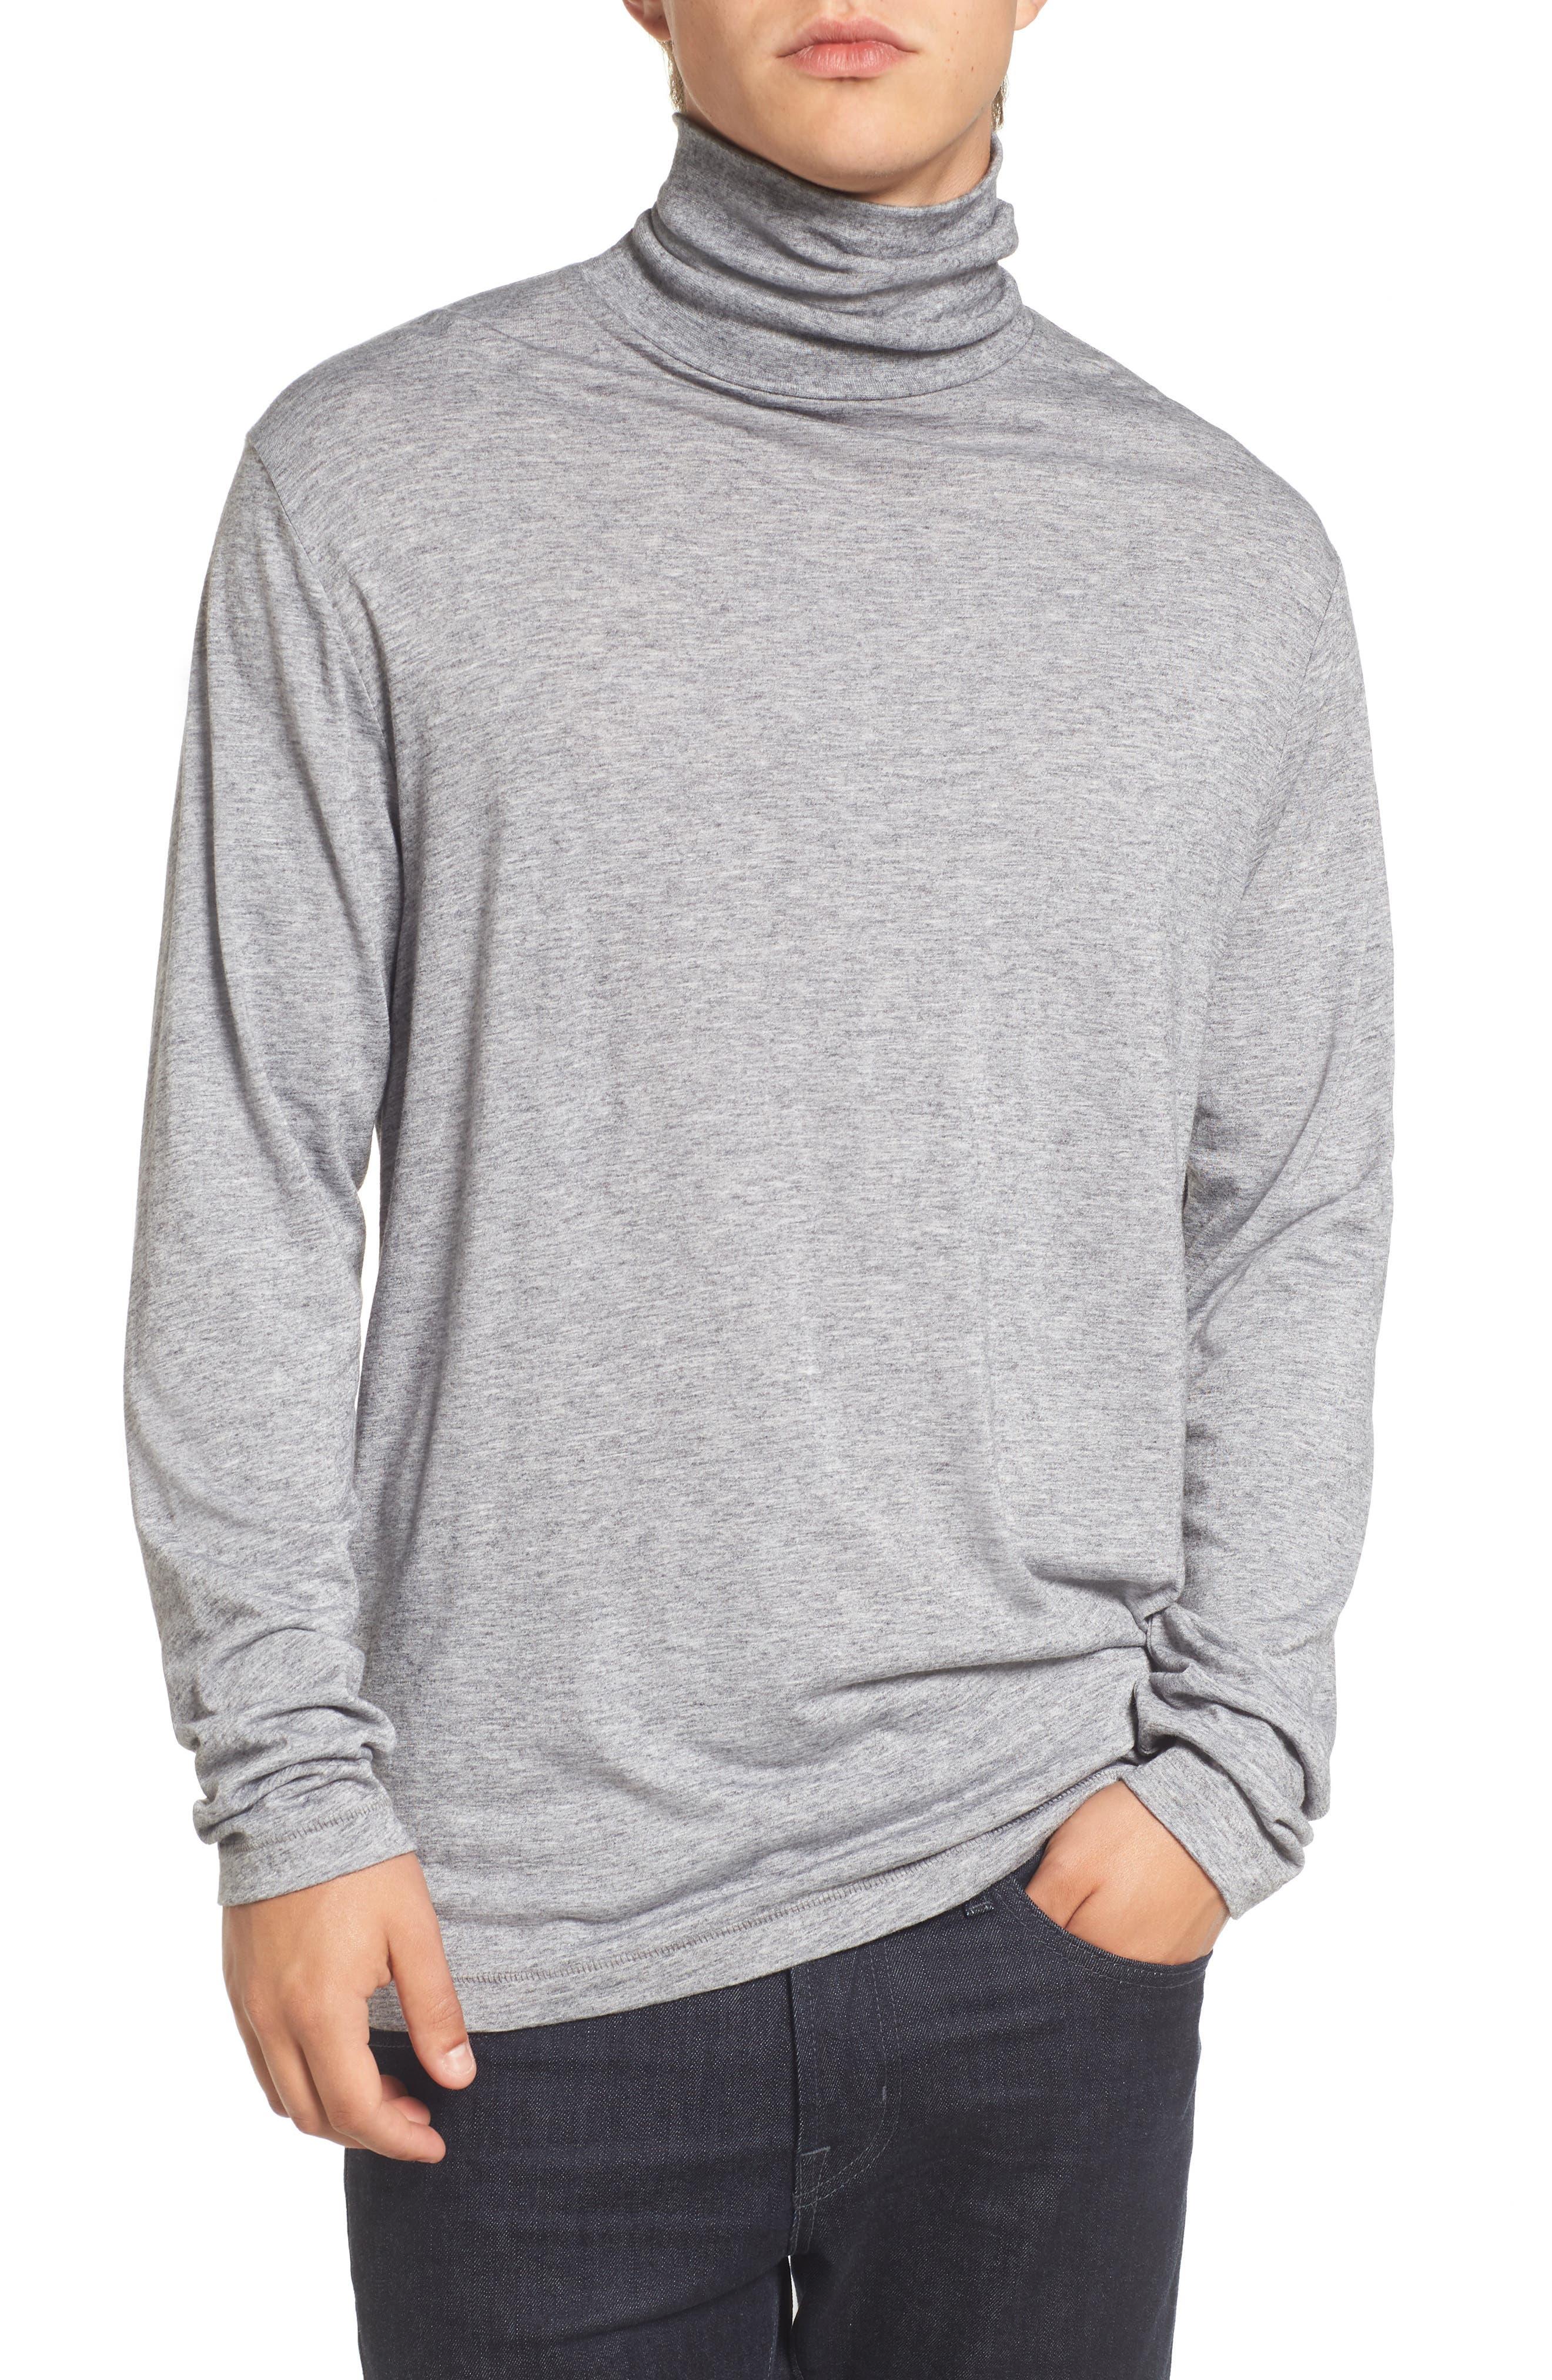 Lightweight Turtleneck Sweater,                             Main thumbnail 1, color,                             Grey Melange